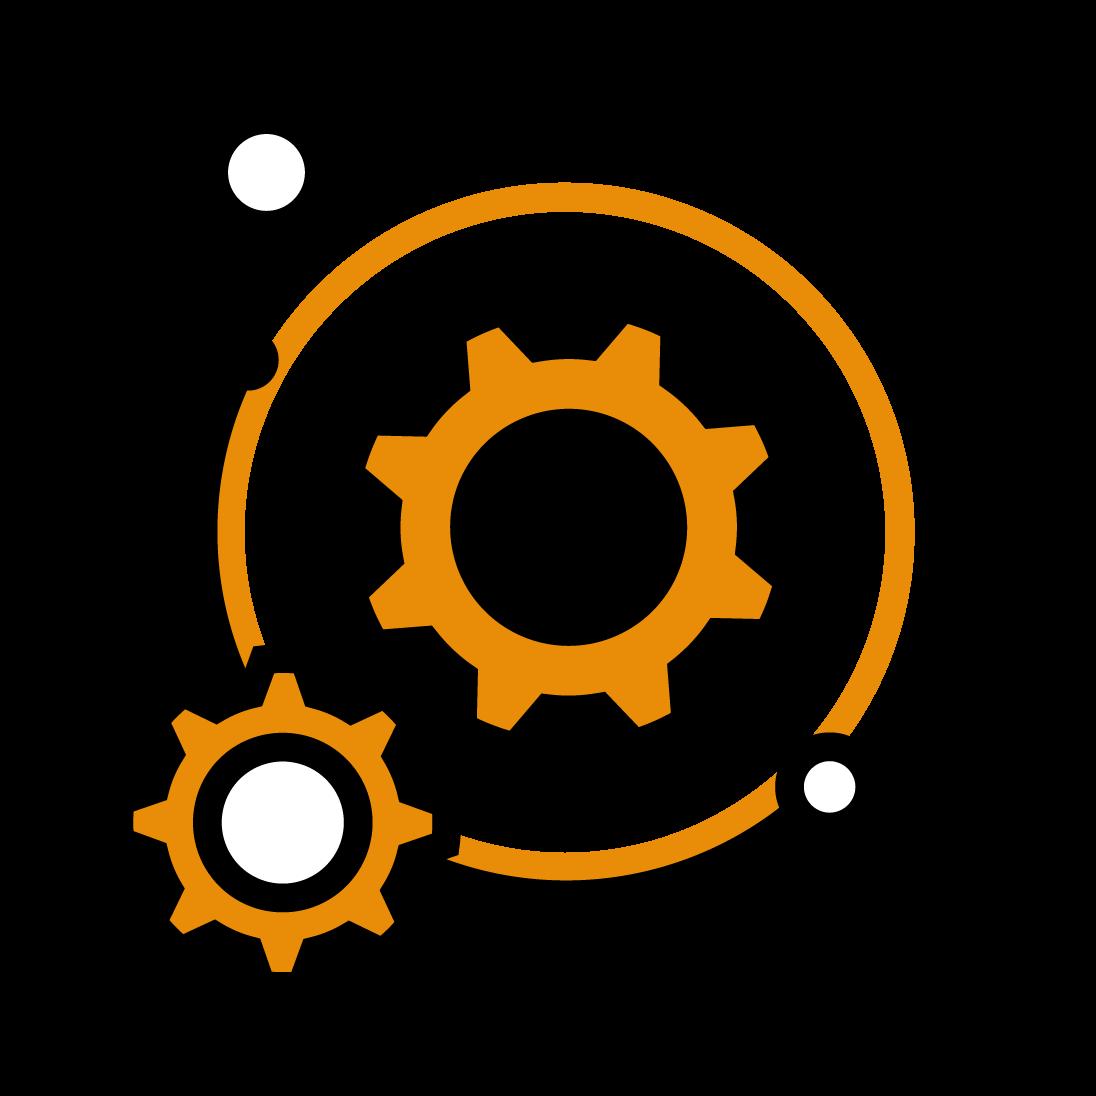 Symbol of gear wheels